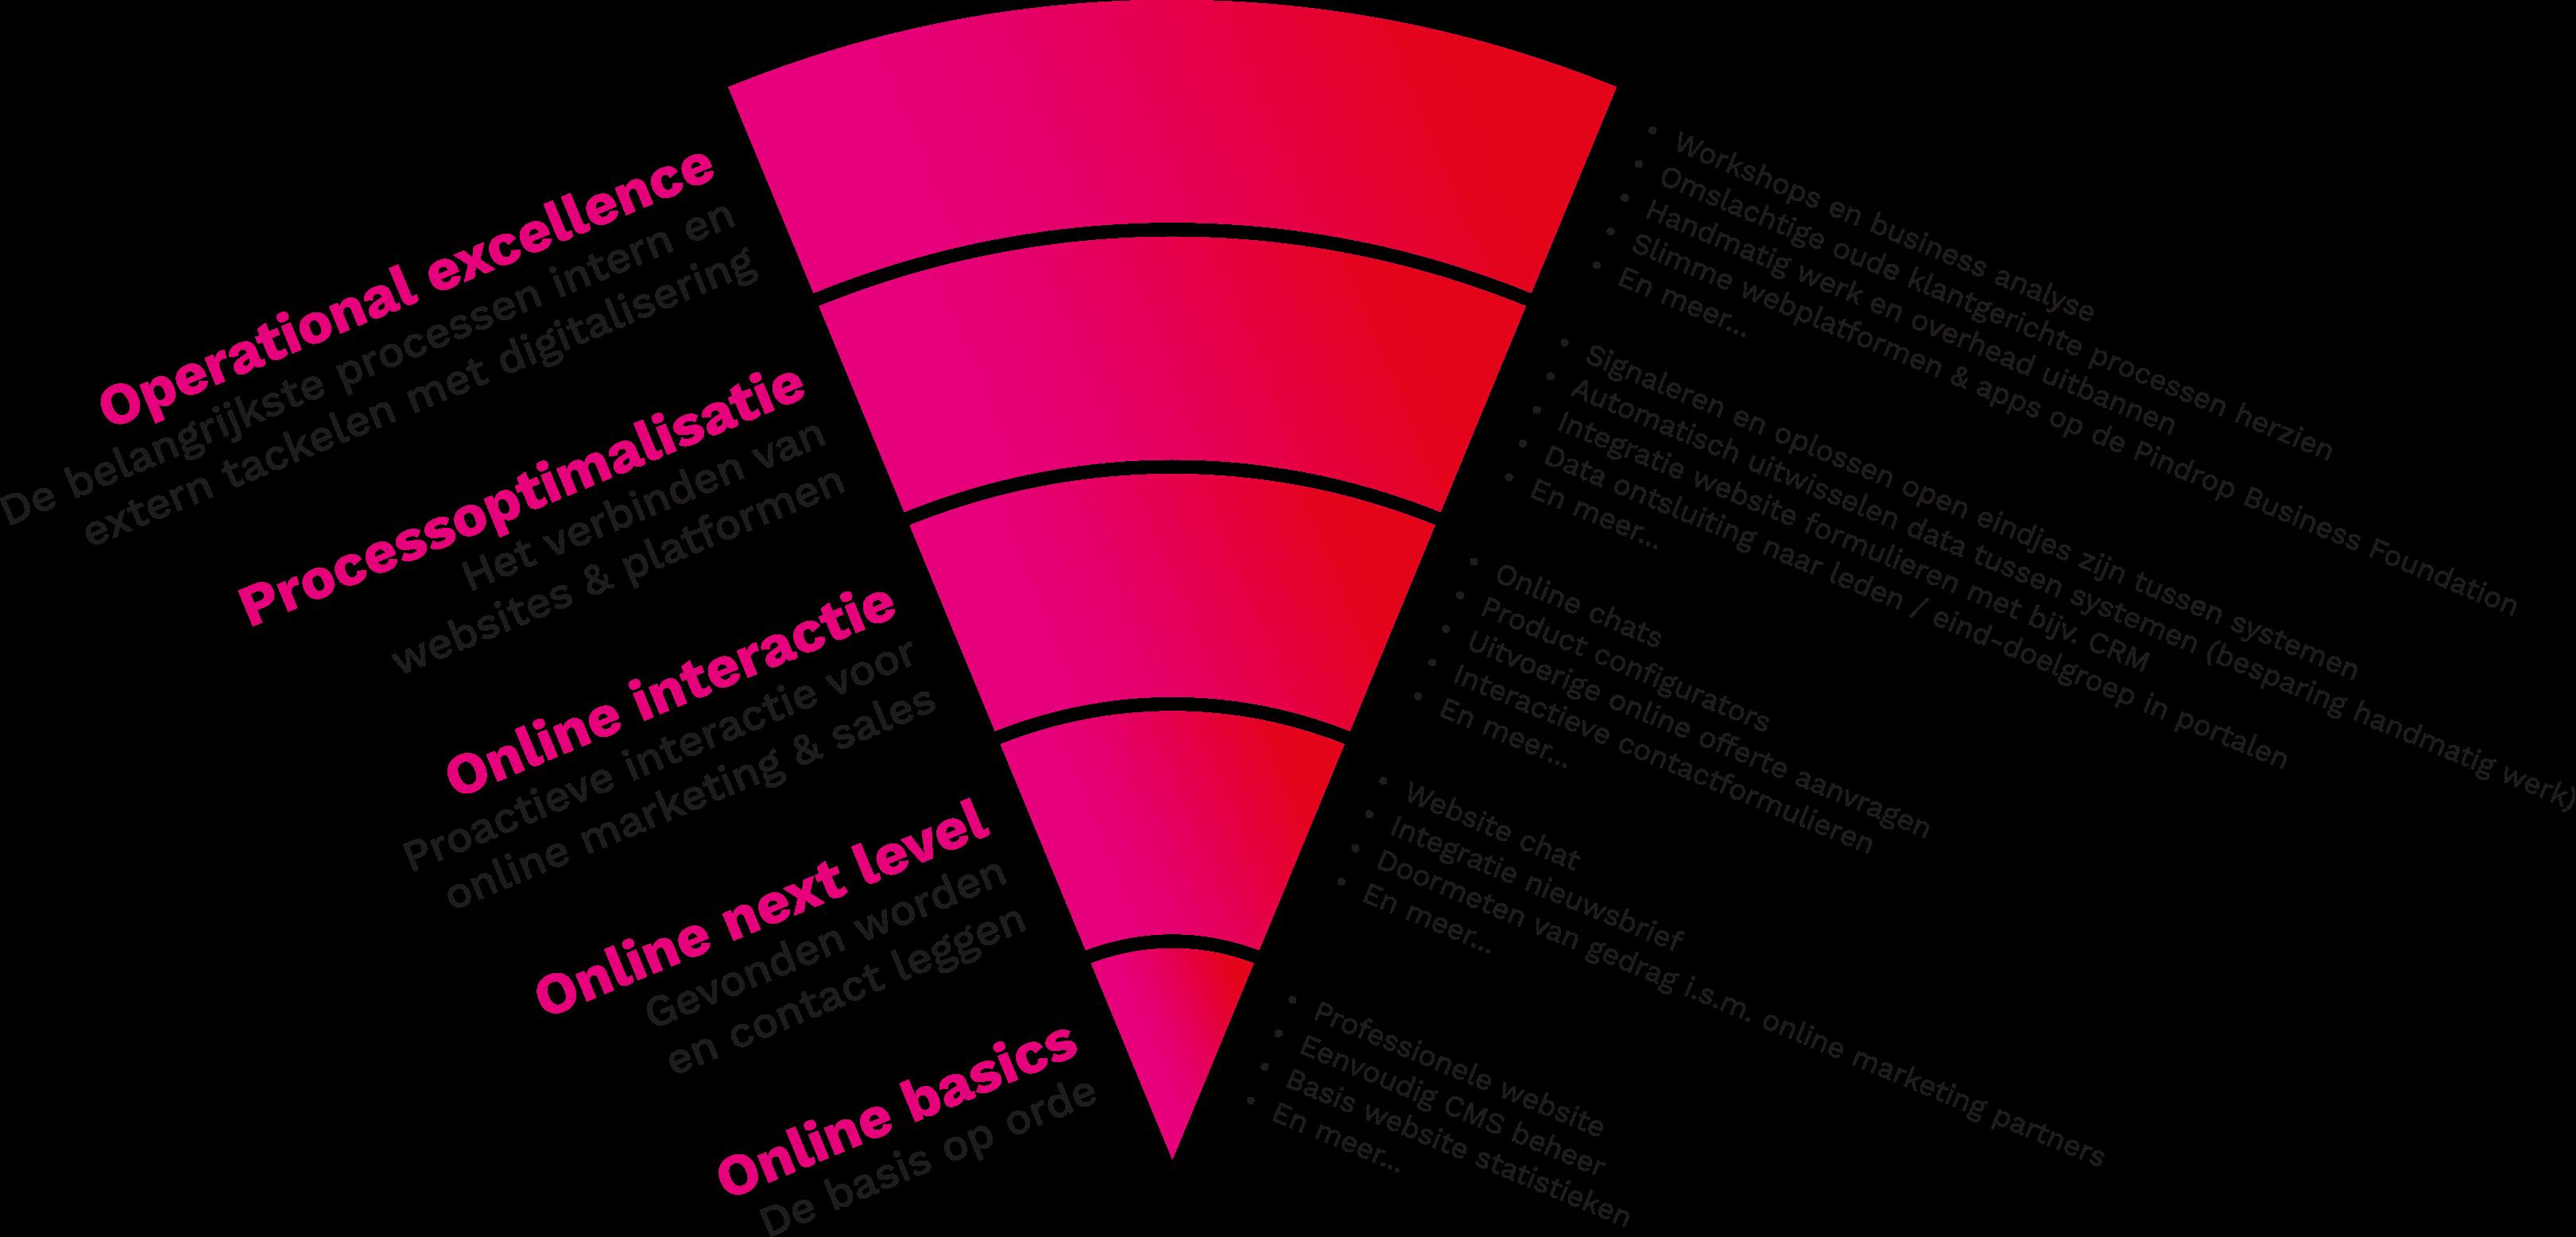 Pindrop model digitalisering organisaties